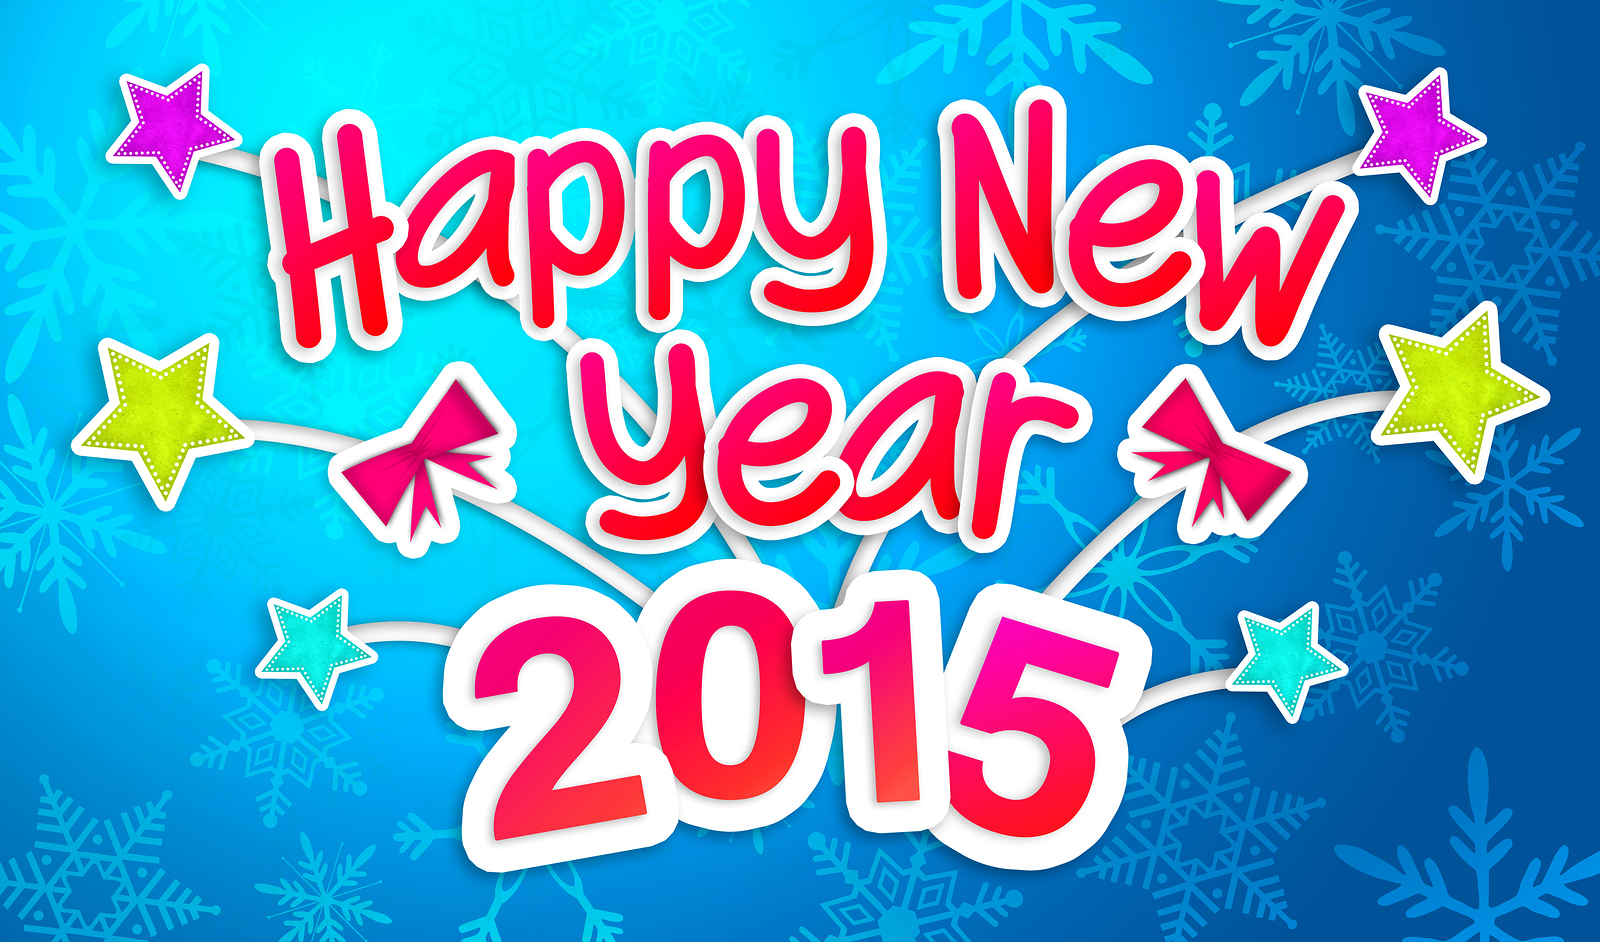 Happy New Year 2015 Wallpaper Desktop Wallpaper with 1600x942 1600x942